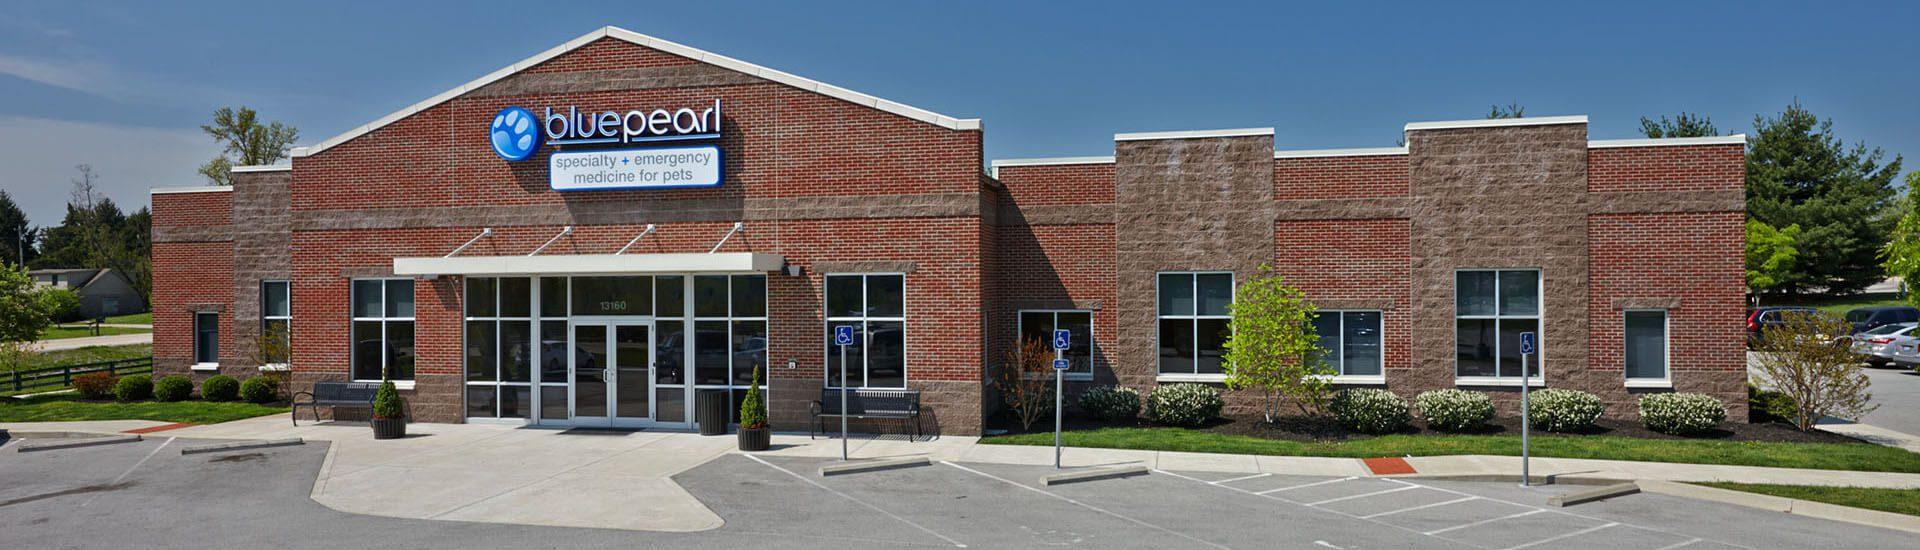 BluePearl Pet Hospital | Louisville, KY | Emergency Vet